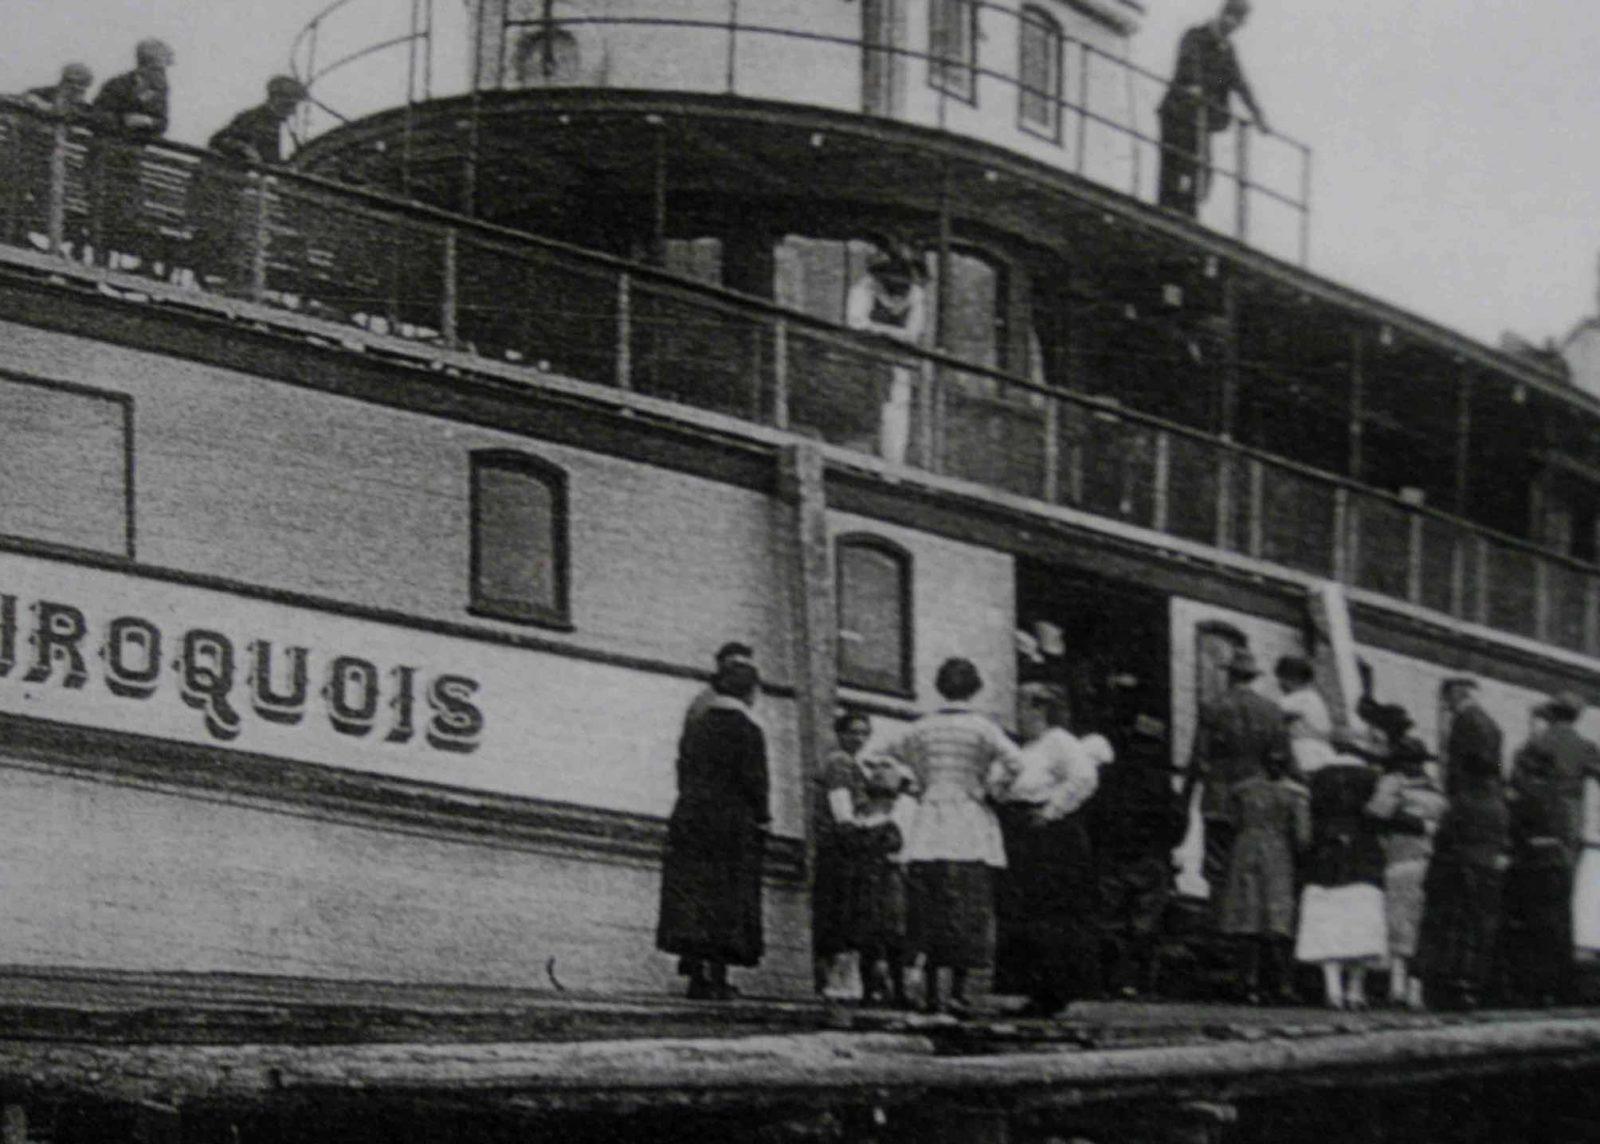 Historic Iriqois photo from the Dorset Heritage Museum